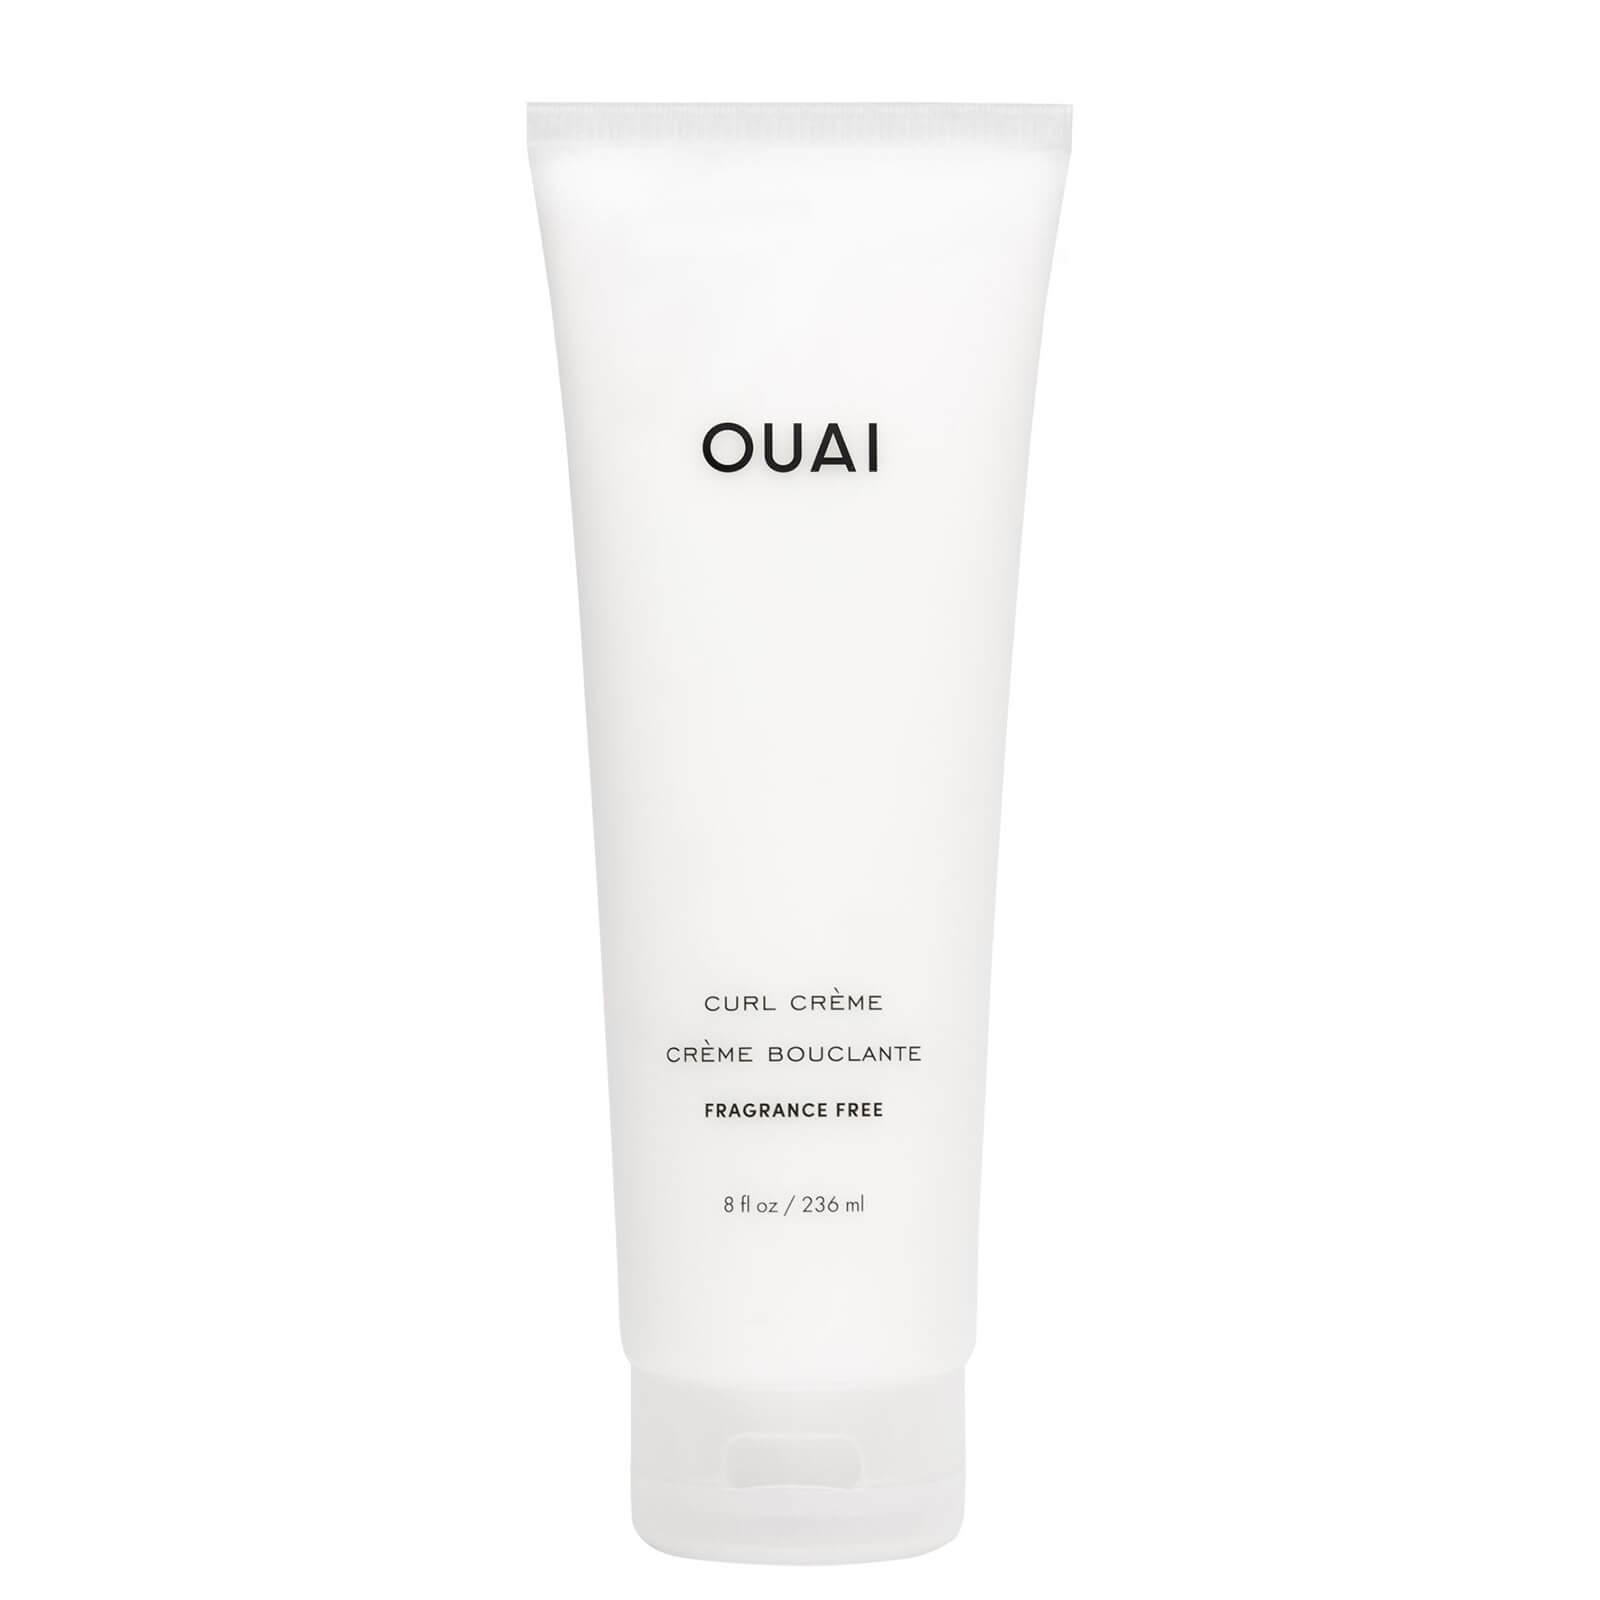 OUAI Fragrance Free Curl Crme 236ml